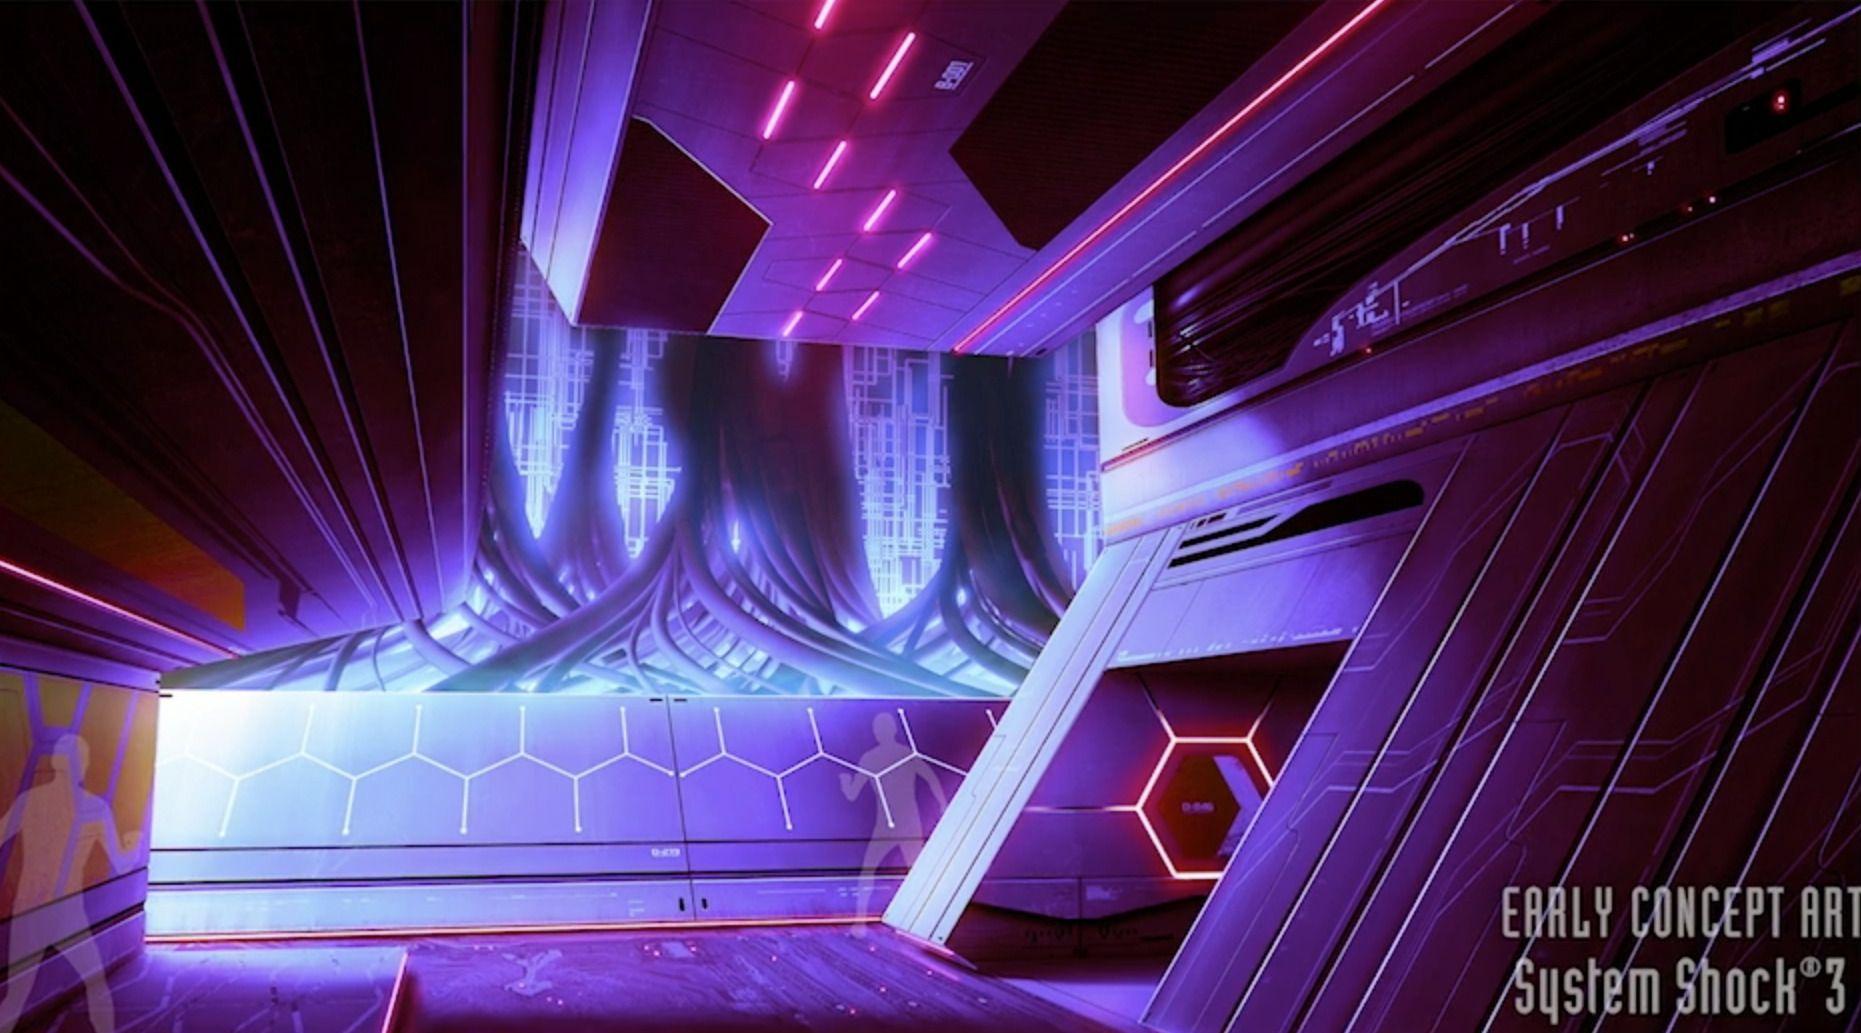 System Shock 3 concept art, approved by SHODAN | TweakTown